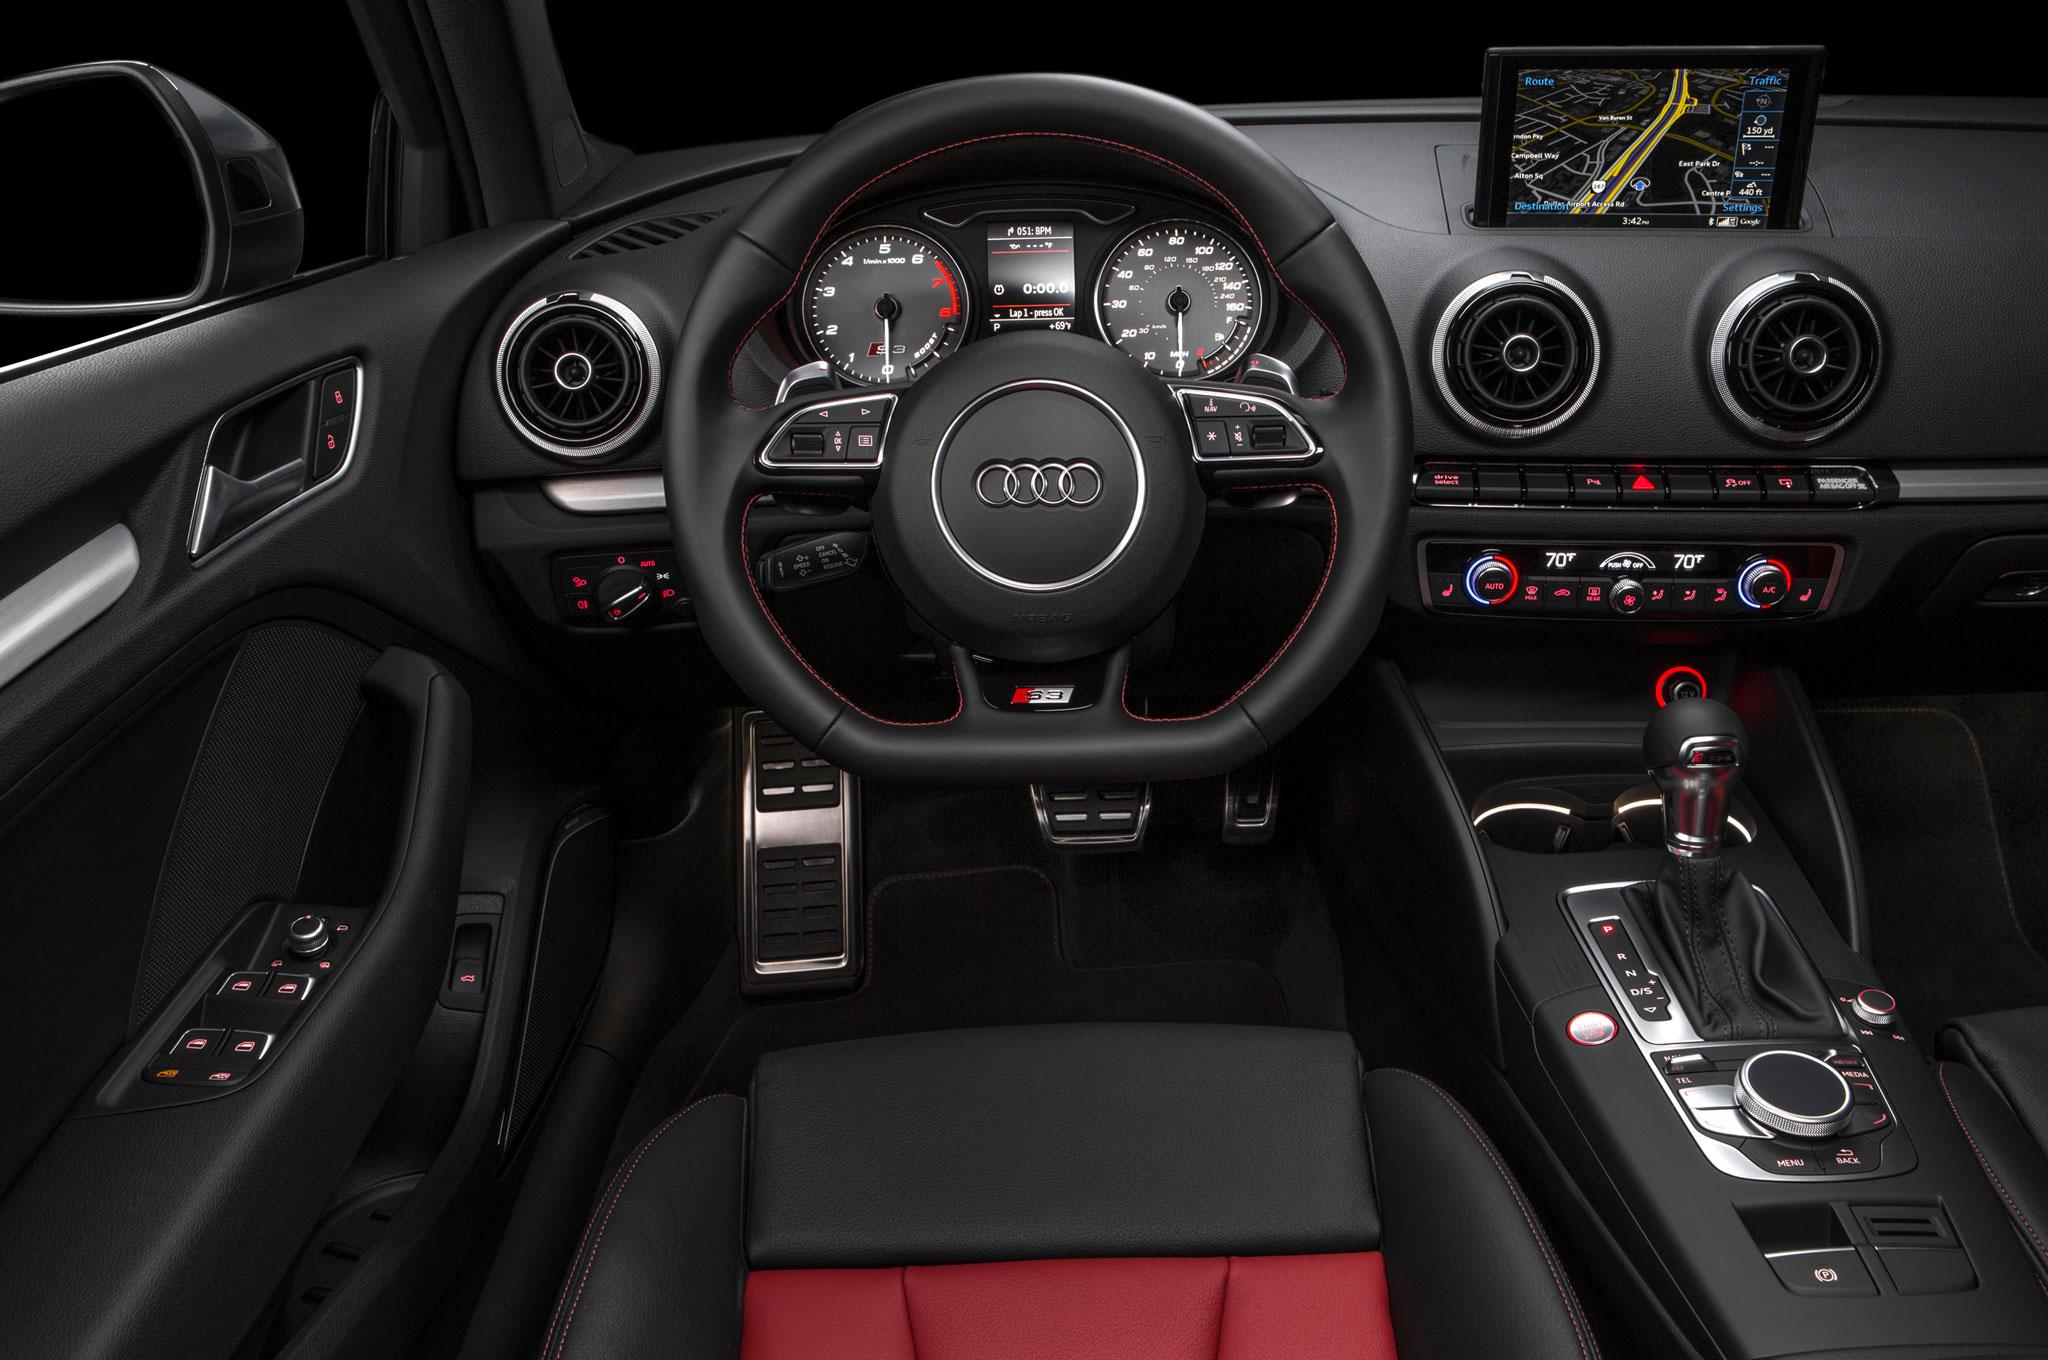 2015 audi s3 sedan limited edition cockpit interior 1209 for Audi s3 interior